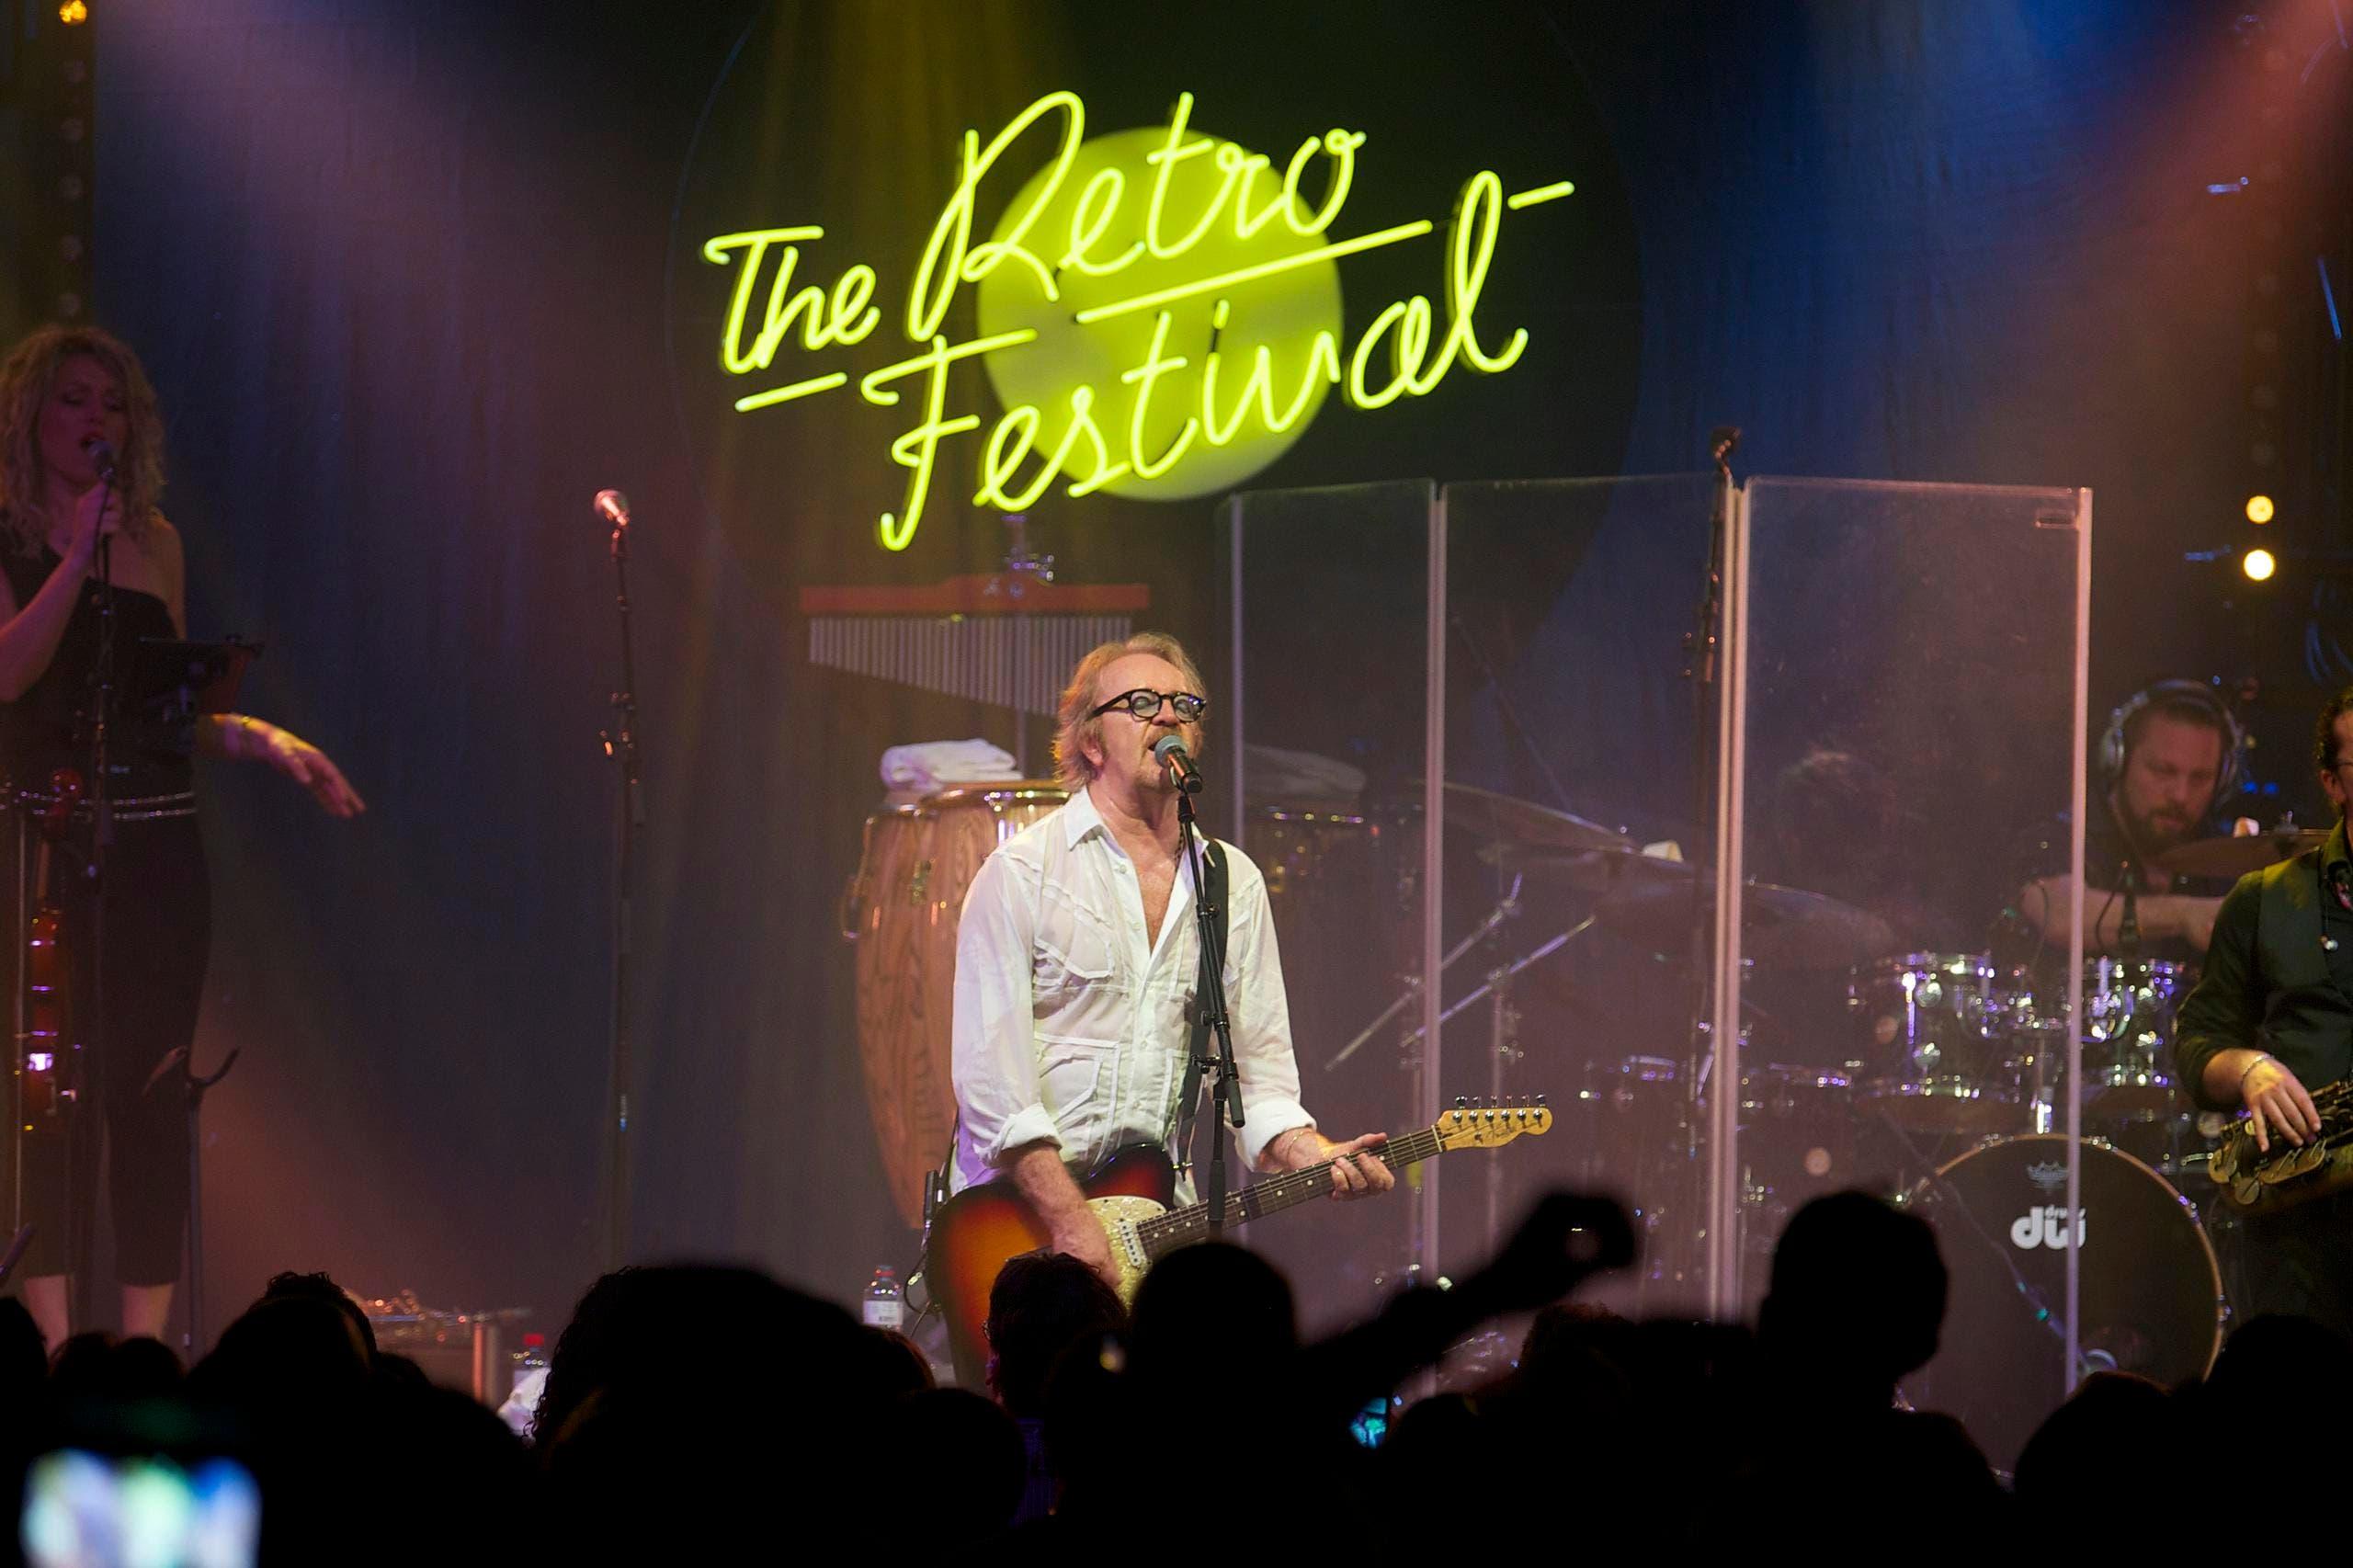 Umberto Tozzi eröffnete das Festival am Mittwoch. (Bild: Marc Gilgen/The Retro Festival)